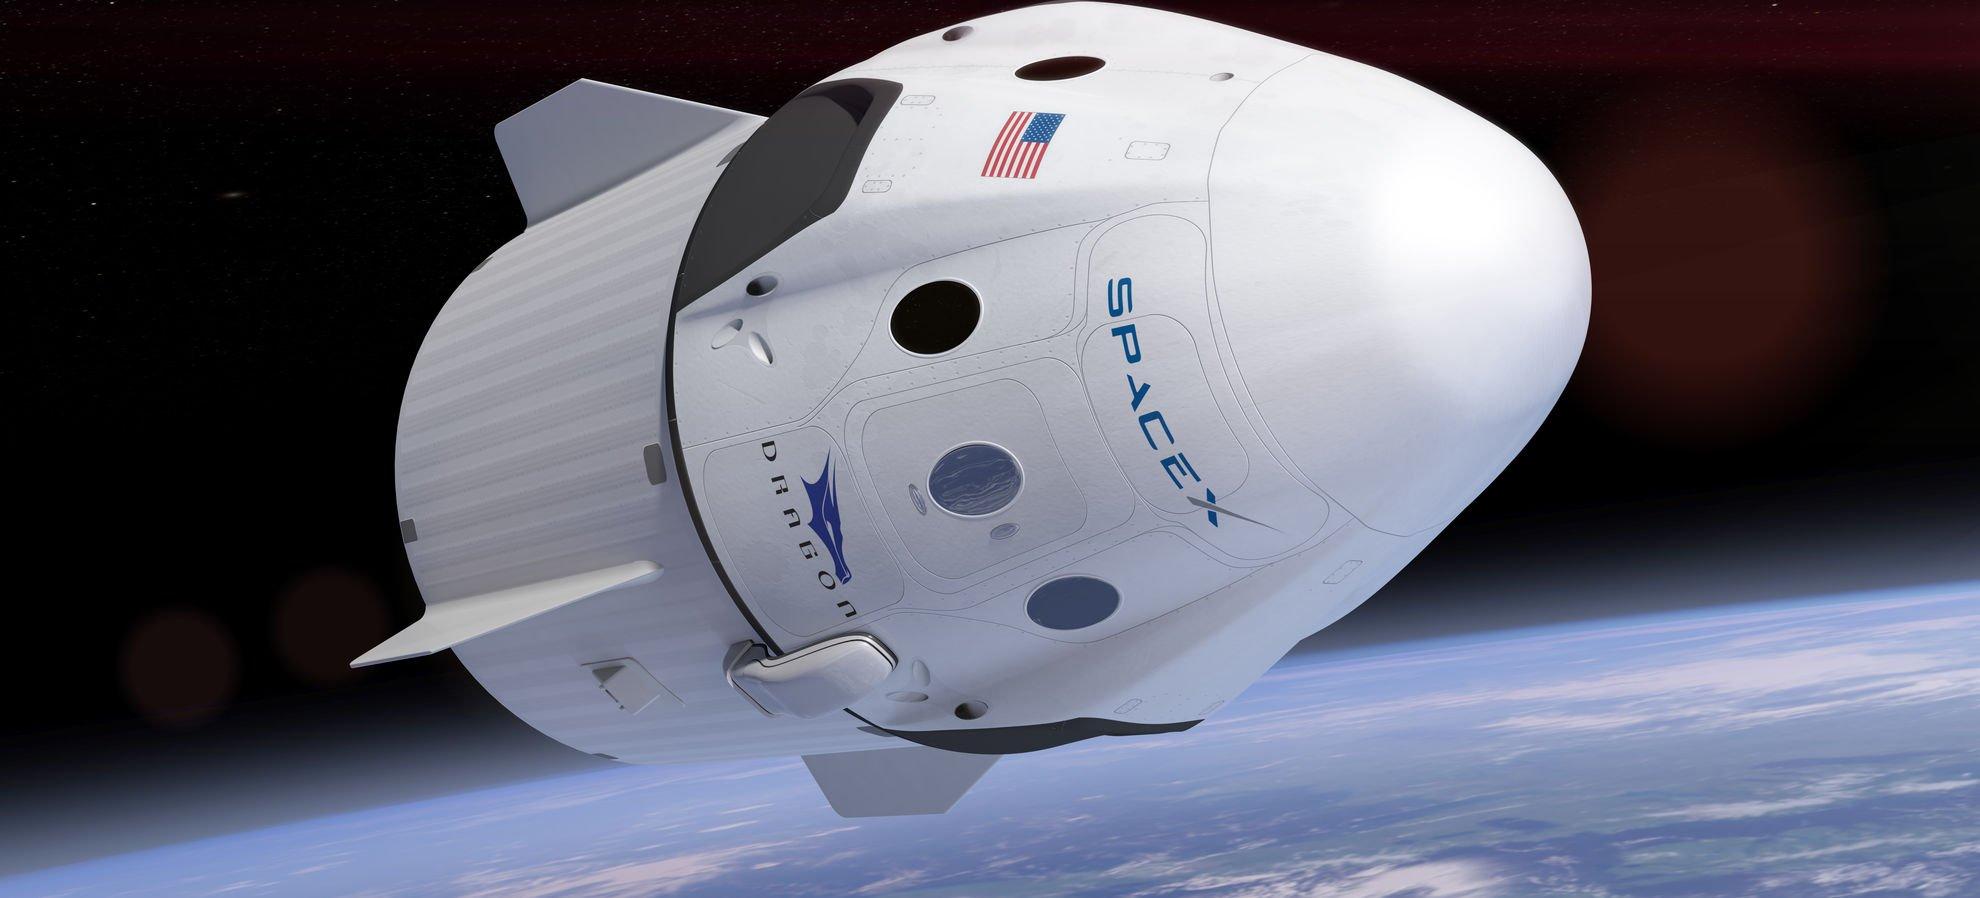 طرح گرافیکی فضاپیمای دراگون اسپیسایکس